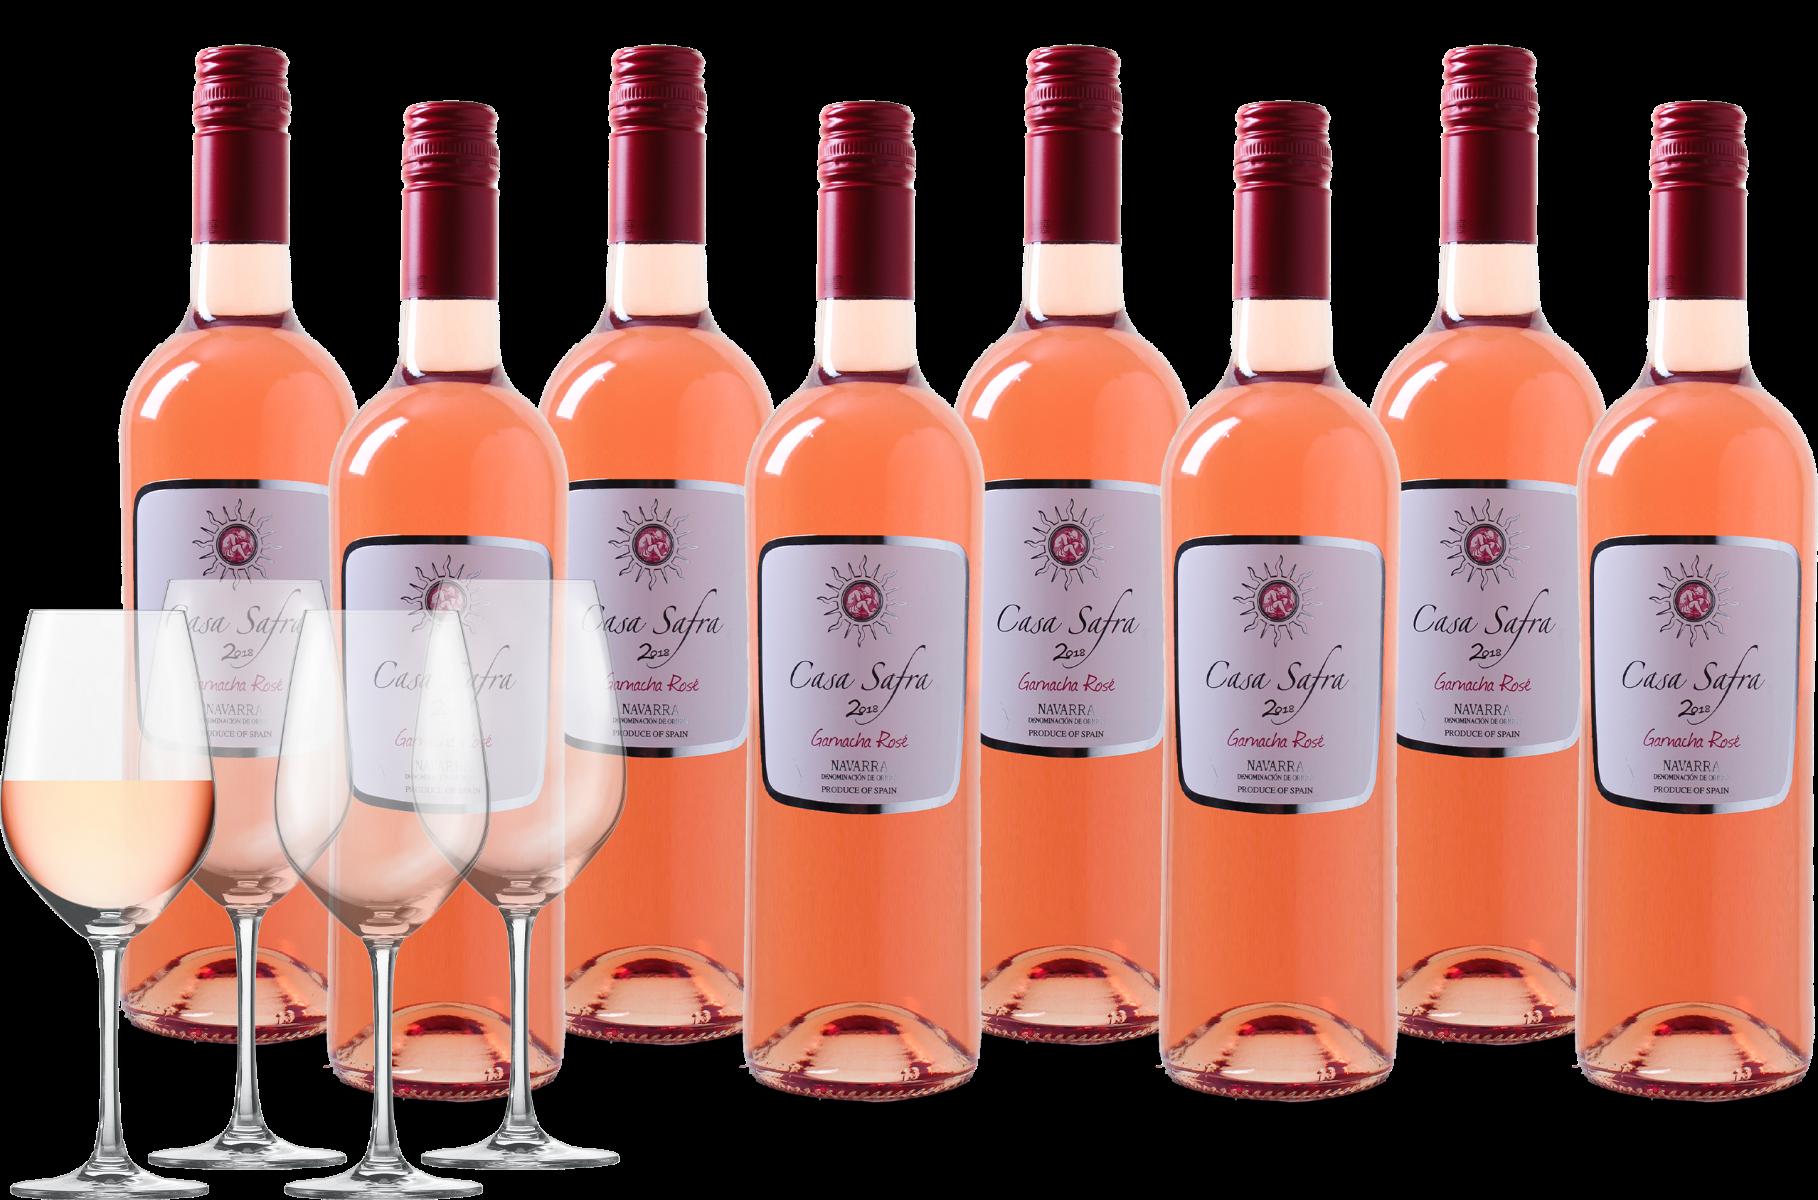 Wijnpakket Casa Safra Garnacha Rosado 8 flessen + 4 glazen